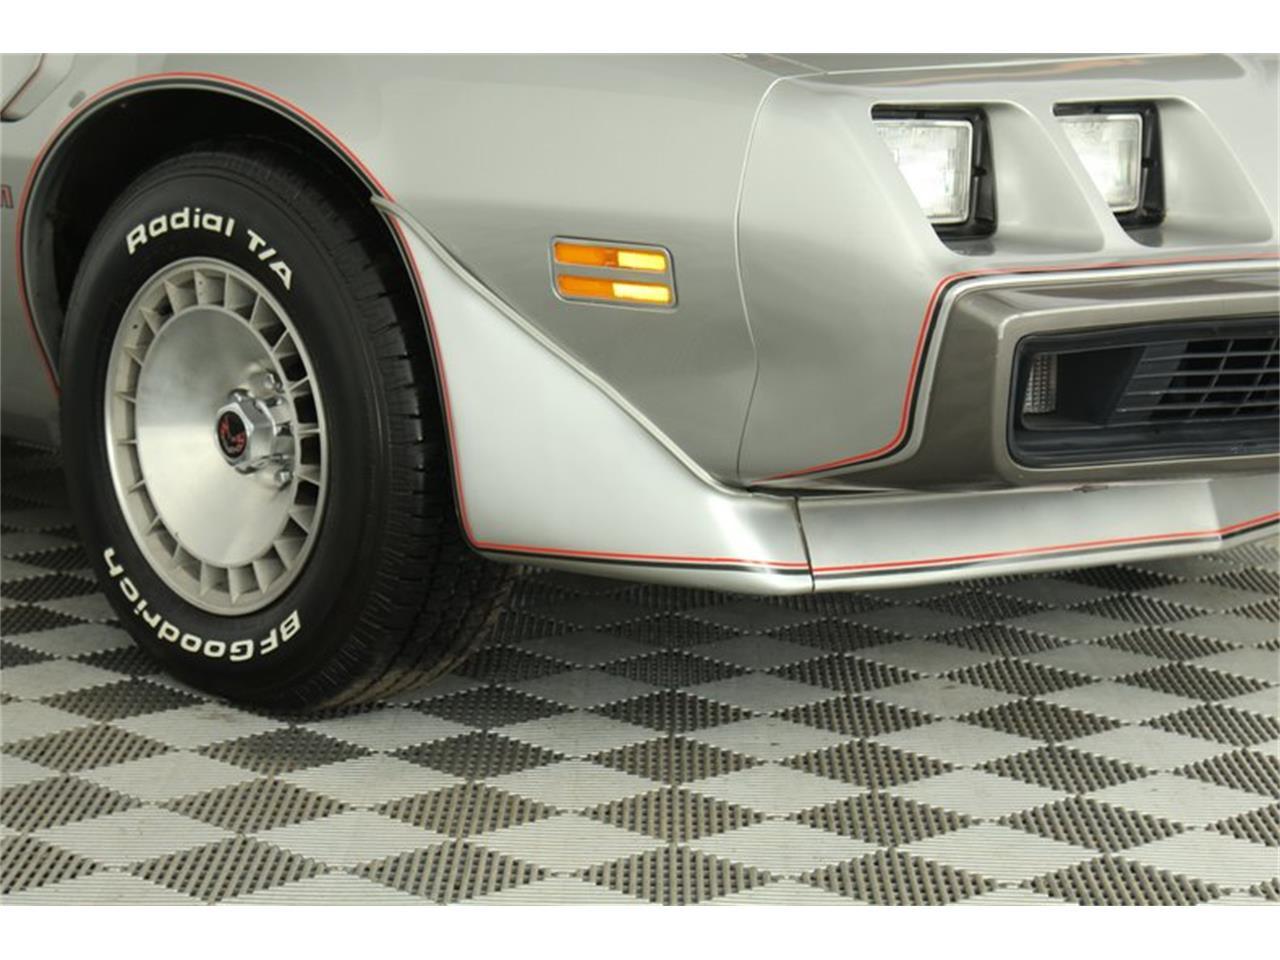 Large Picture of '79 Pontiac Firebird Trans Am located in Elyria Ohio - $39,900.00 - Q6YC